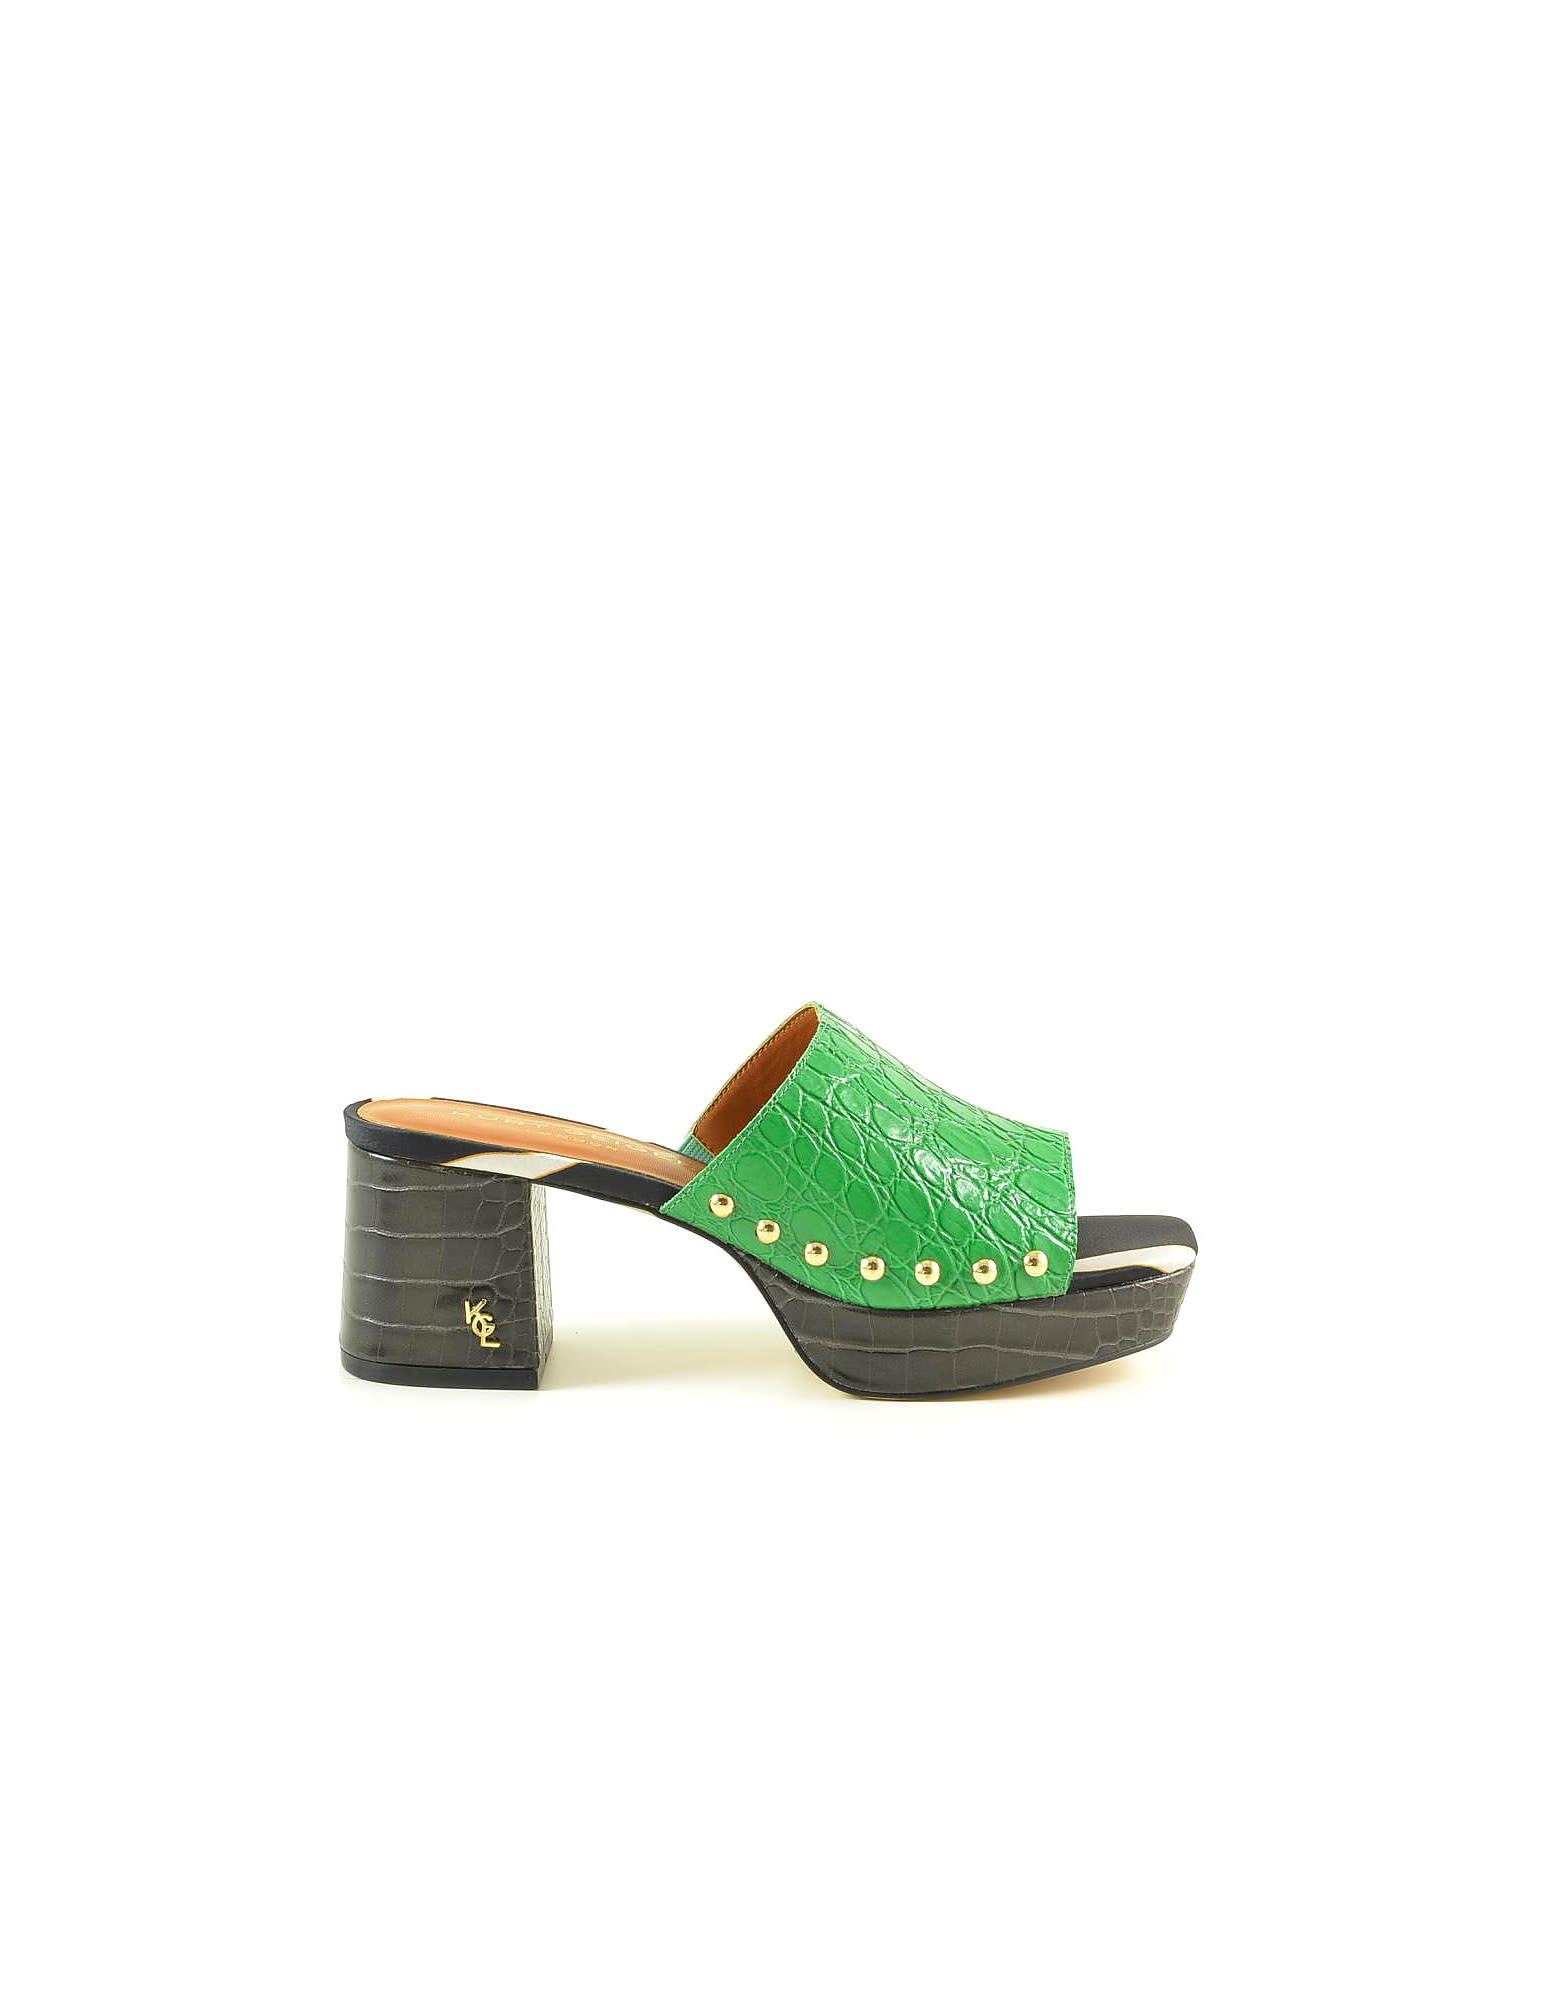 Black/green Croco Embossed Leather Mid-heel Slide Sandals